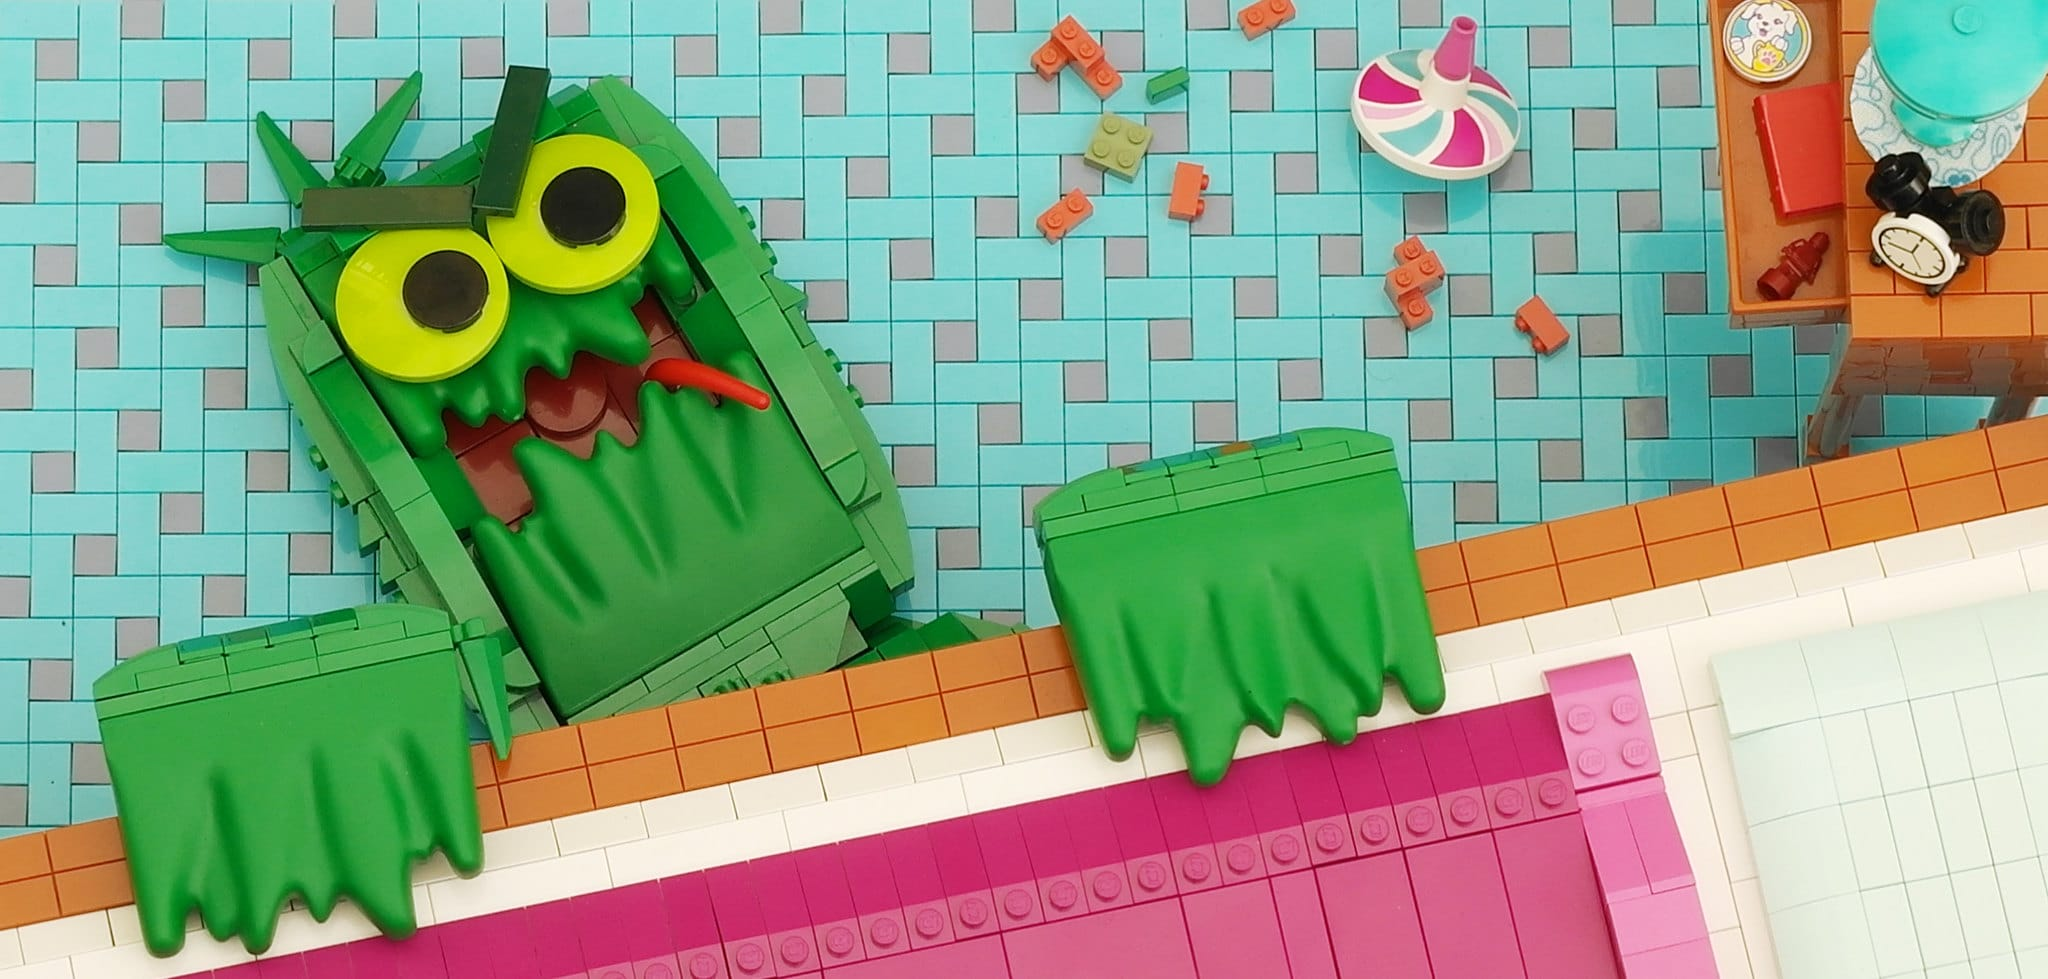 LEGO Iron Builder Duplo Gras Monster